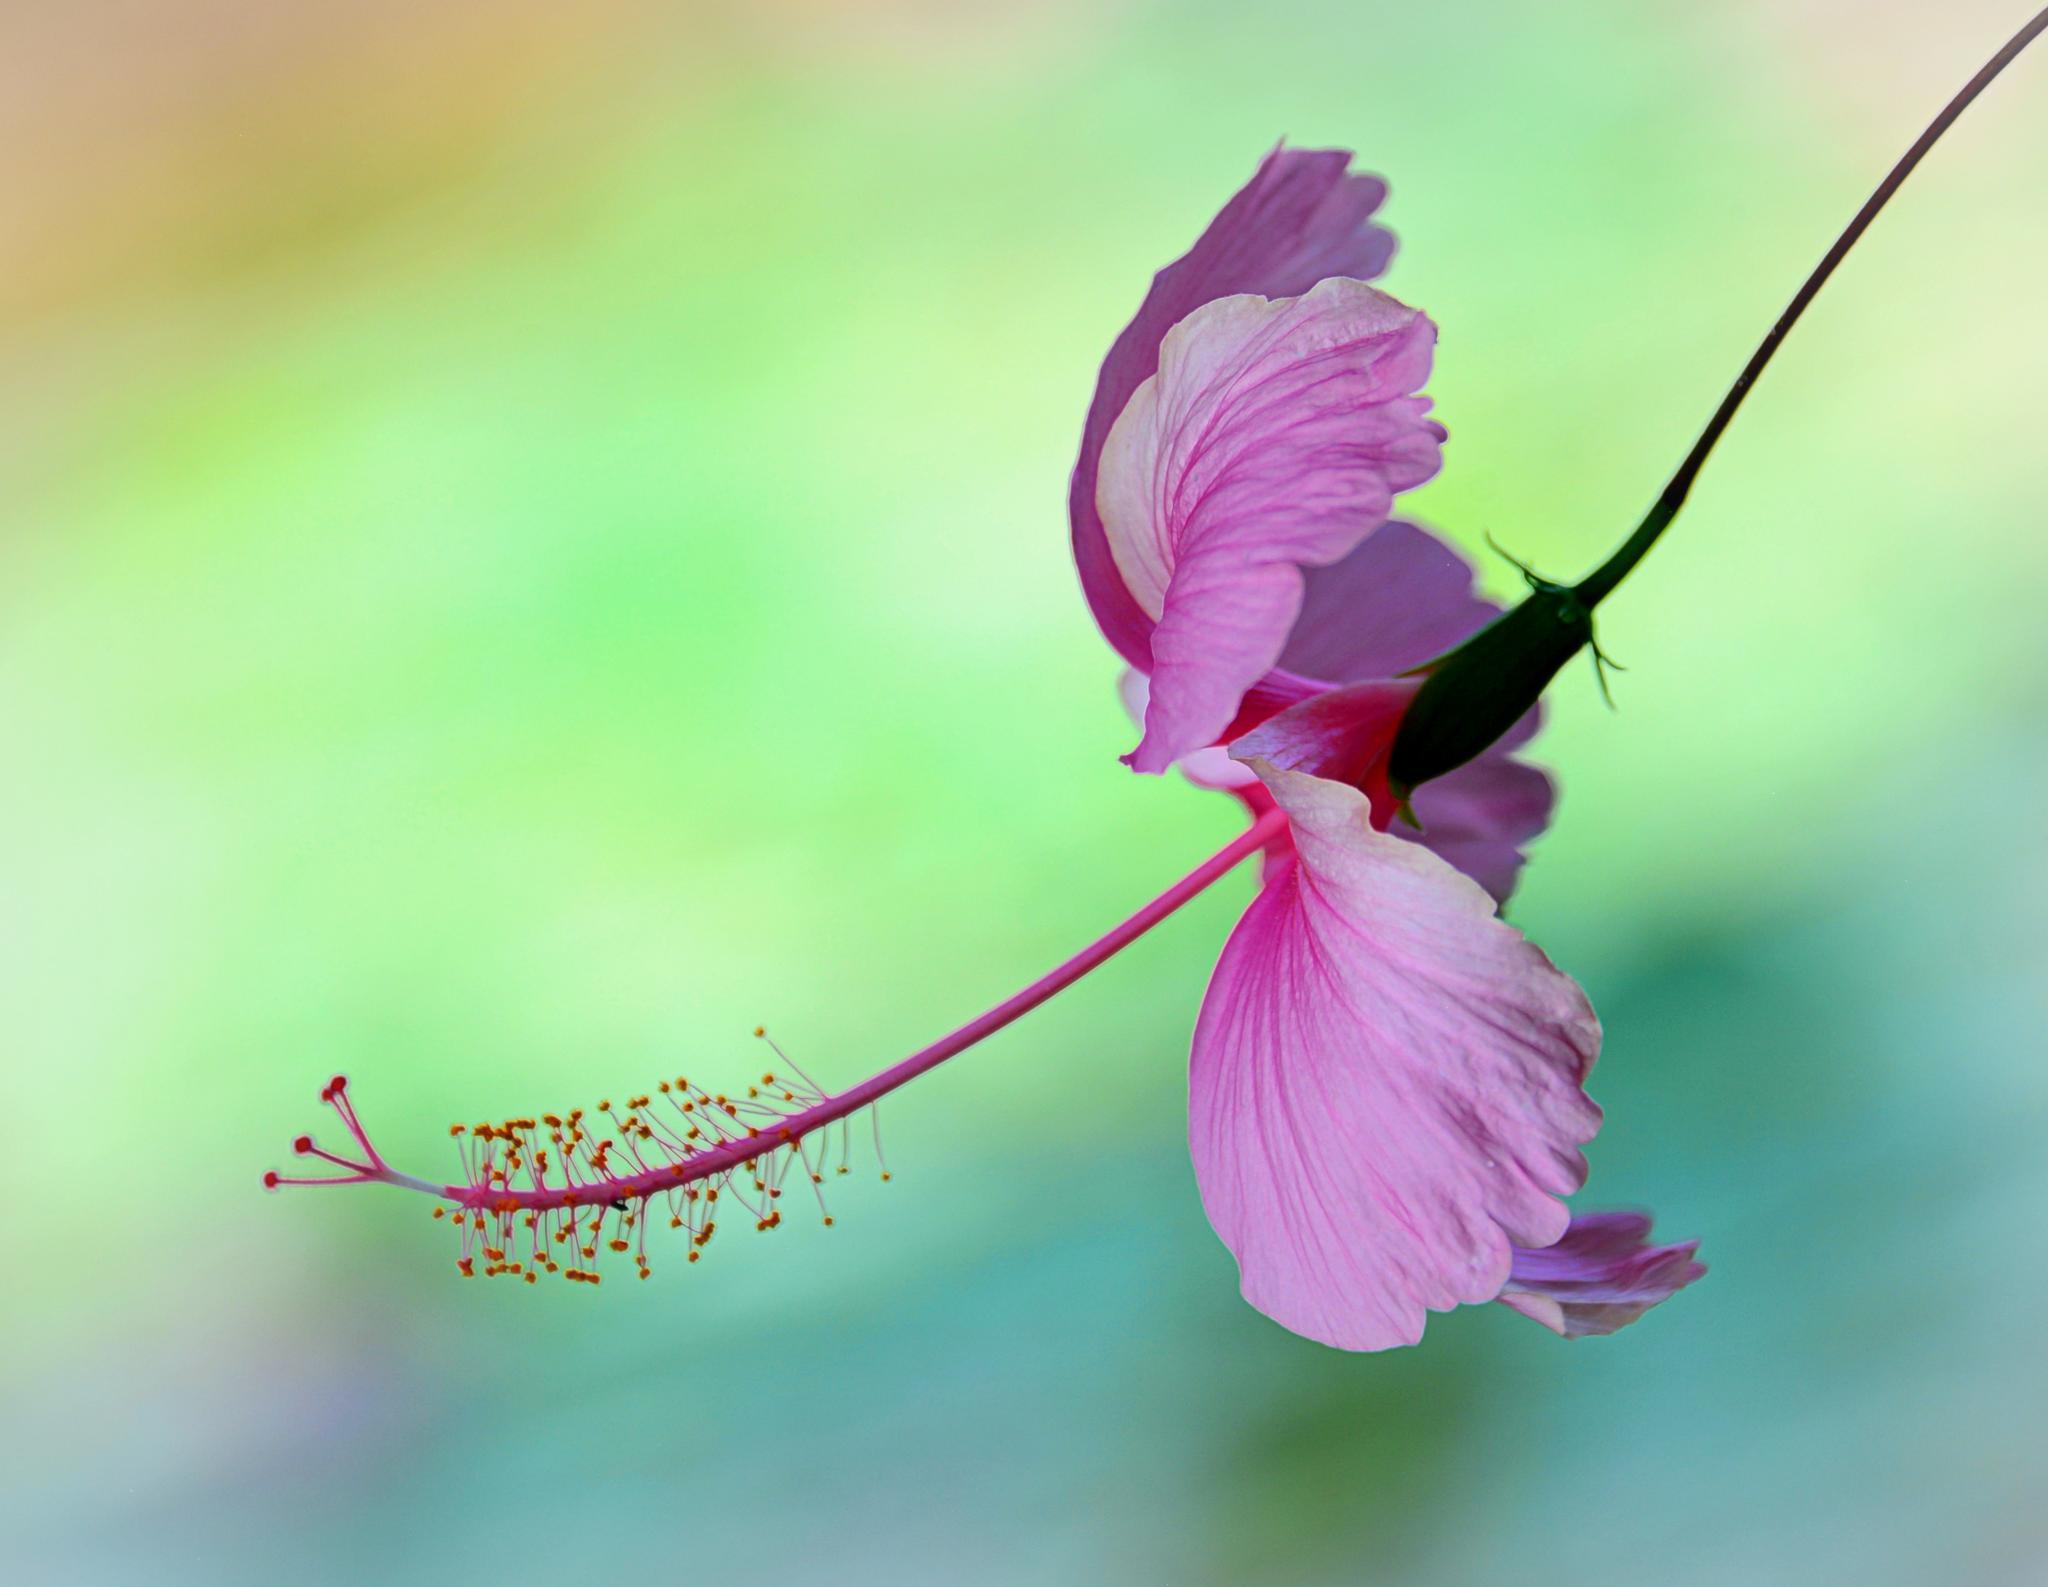 Whispering Air by Brian Mei